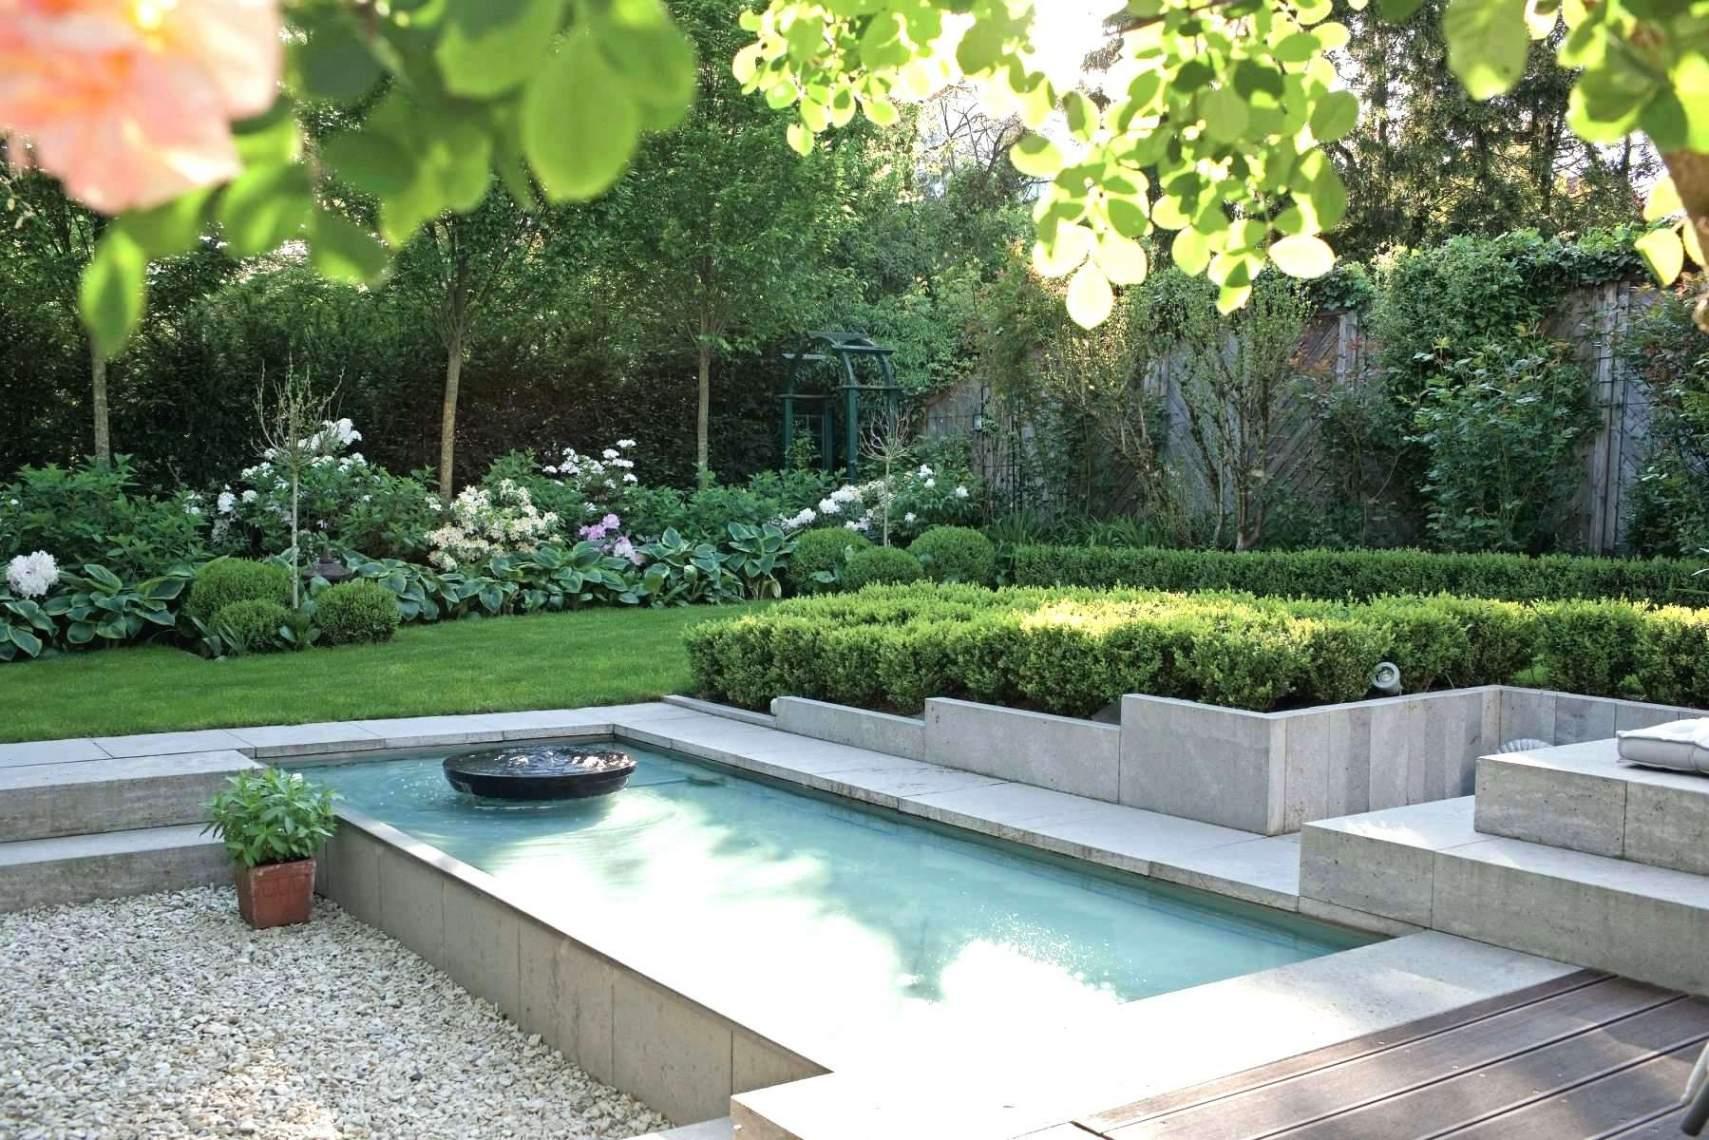 37 genial garten selbst gestalten tipps wintergarten mediterran gestalten wintergarten mediterran gestalten